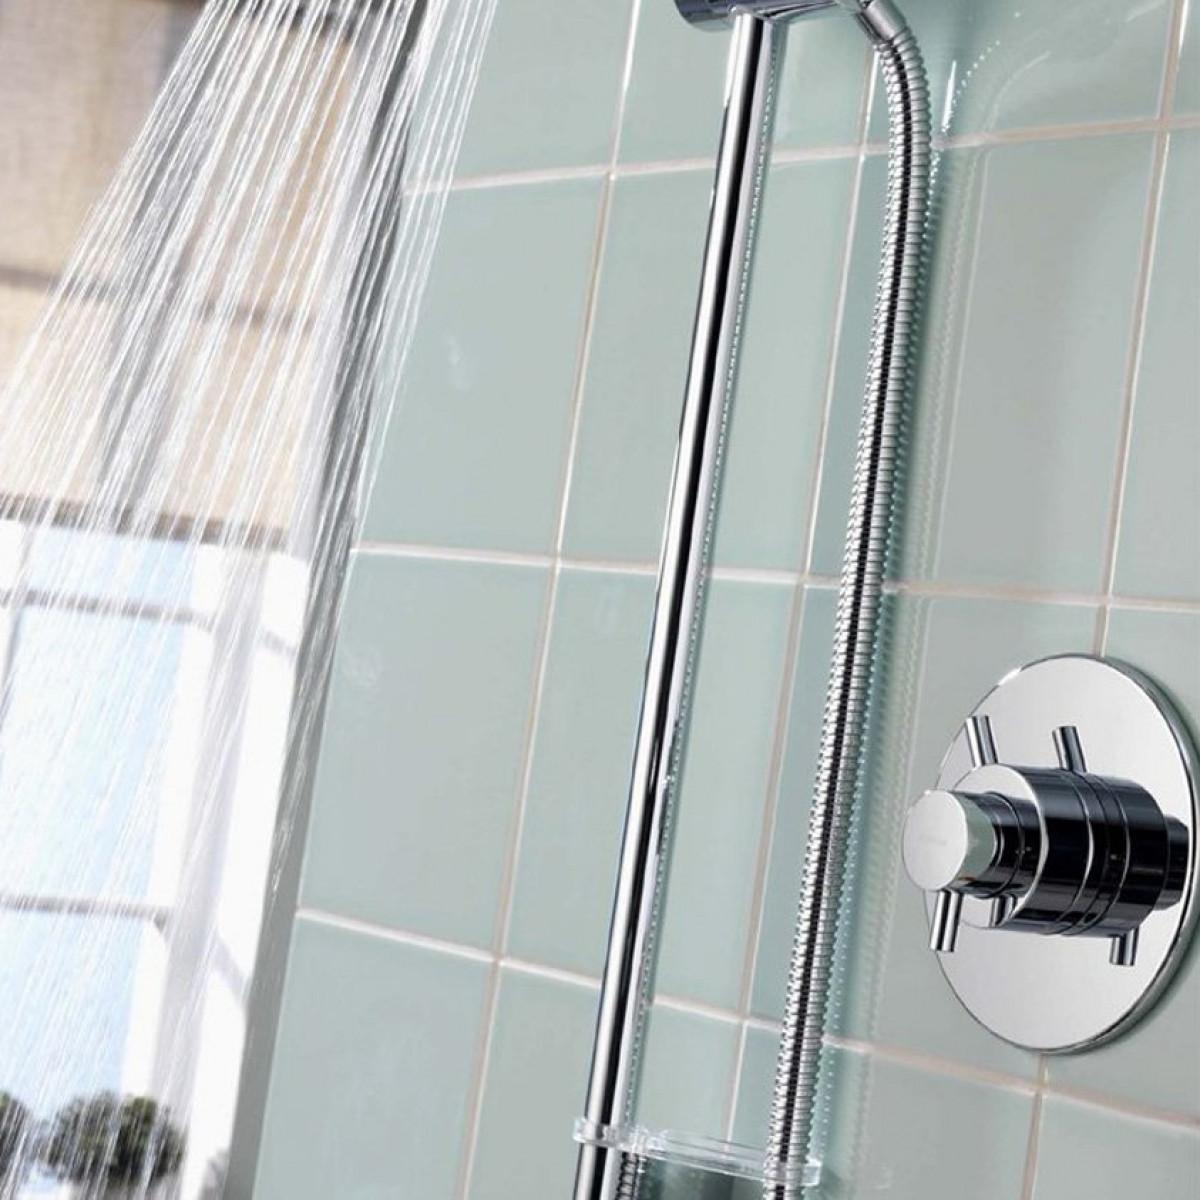 Aqualisa Aspire Concealed Shower with Adjustable 105mm Harmony Head -